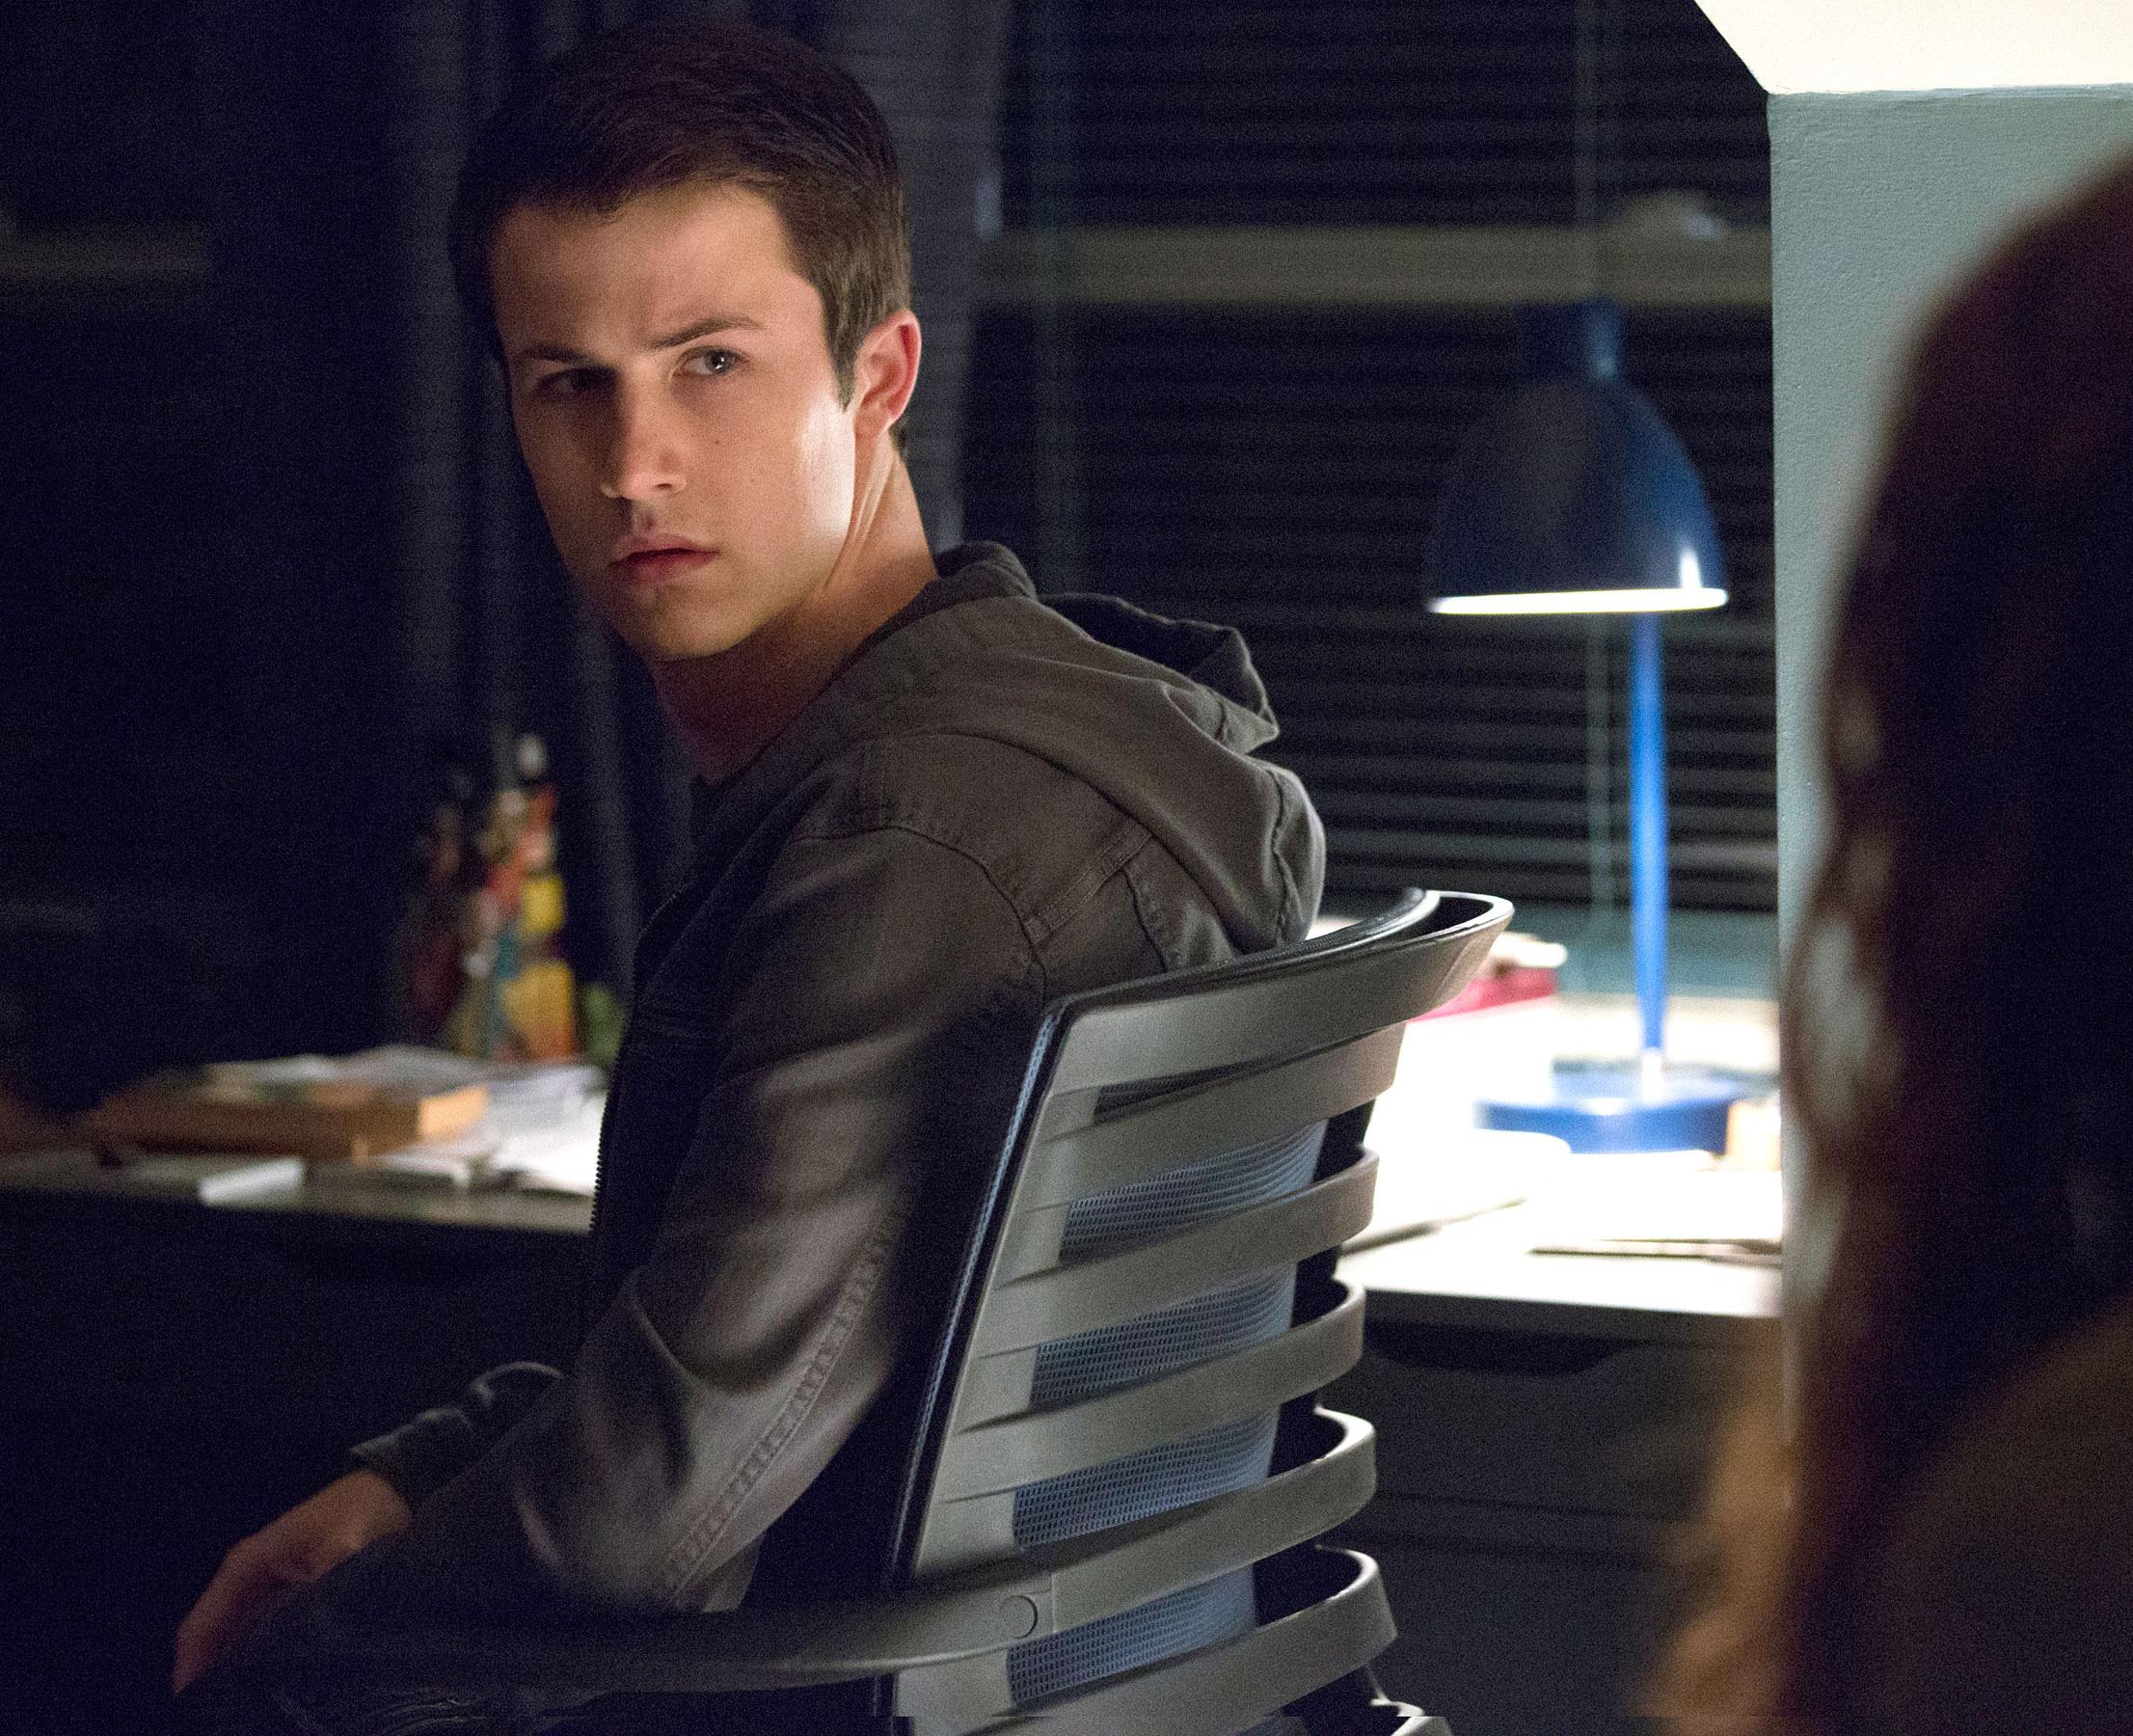 Clay jensen 13 reasons why season 2 hd tv shows 4k - 13 reasons why wallpaper hd ...